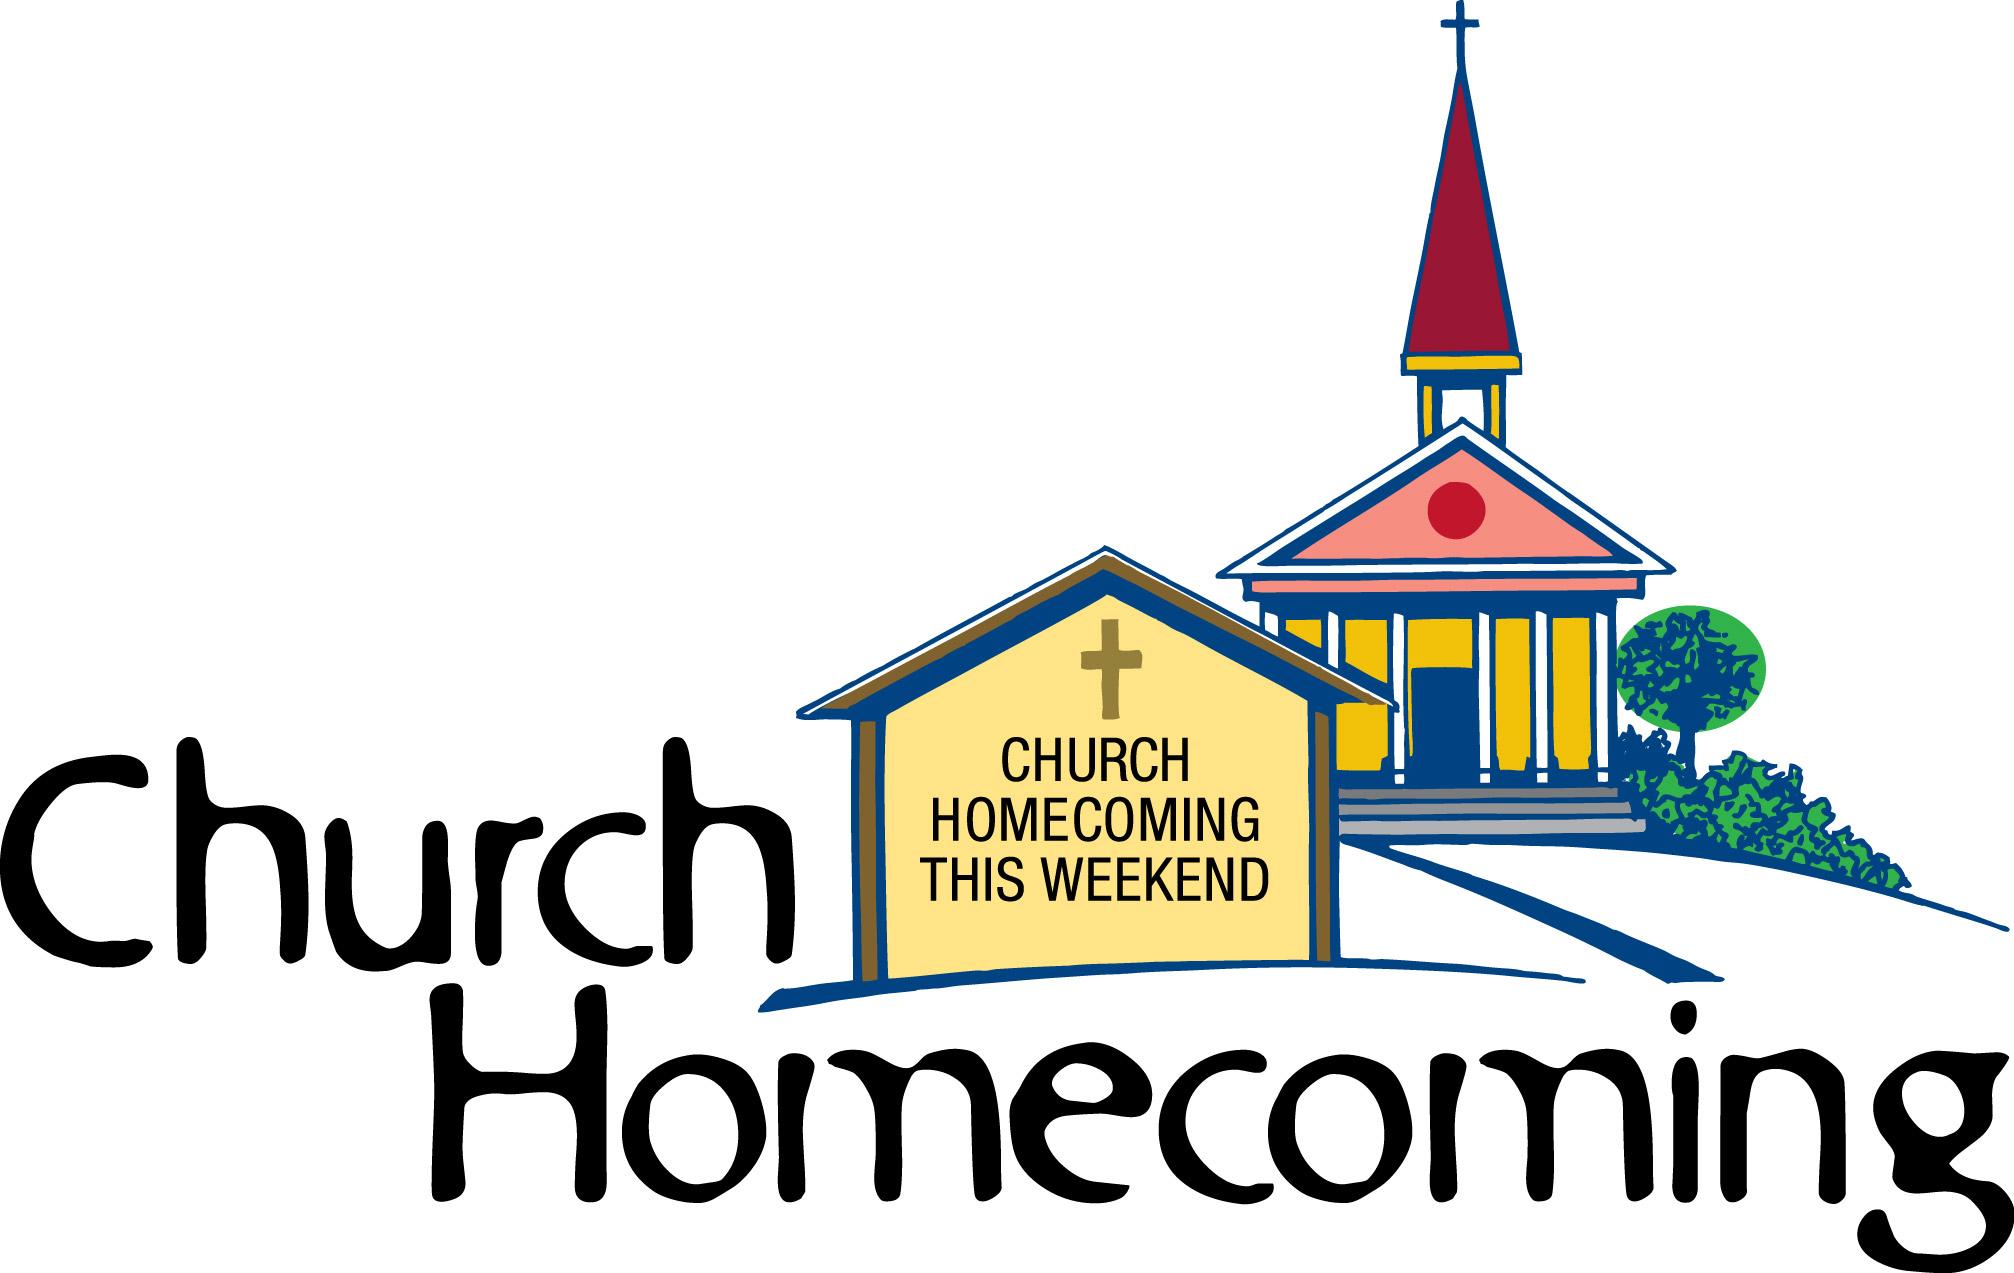 Homecoming clipart. Church